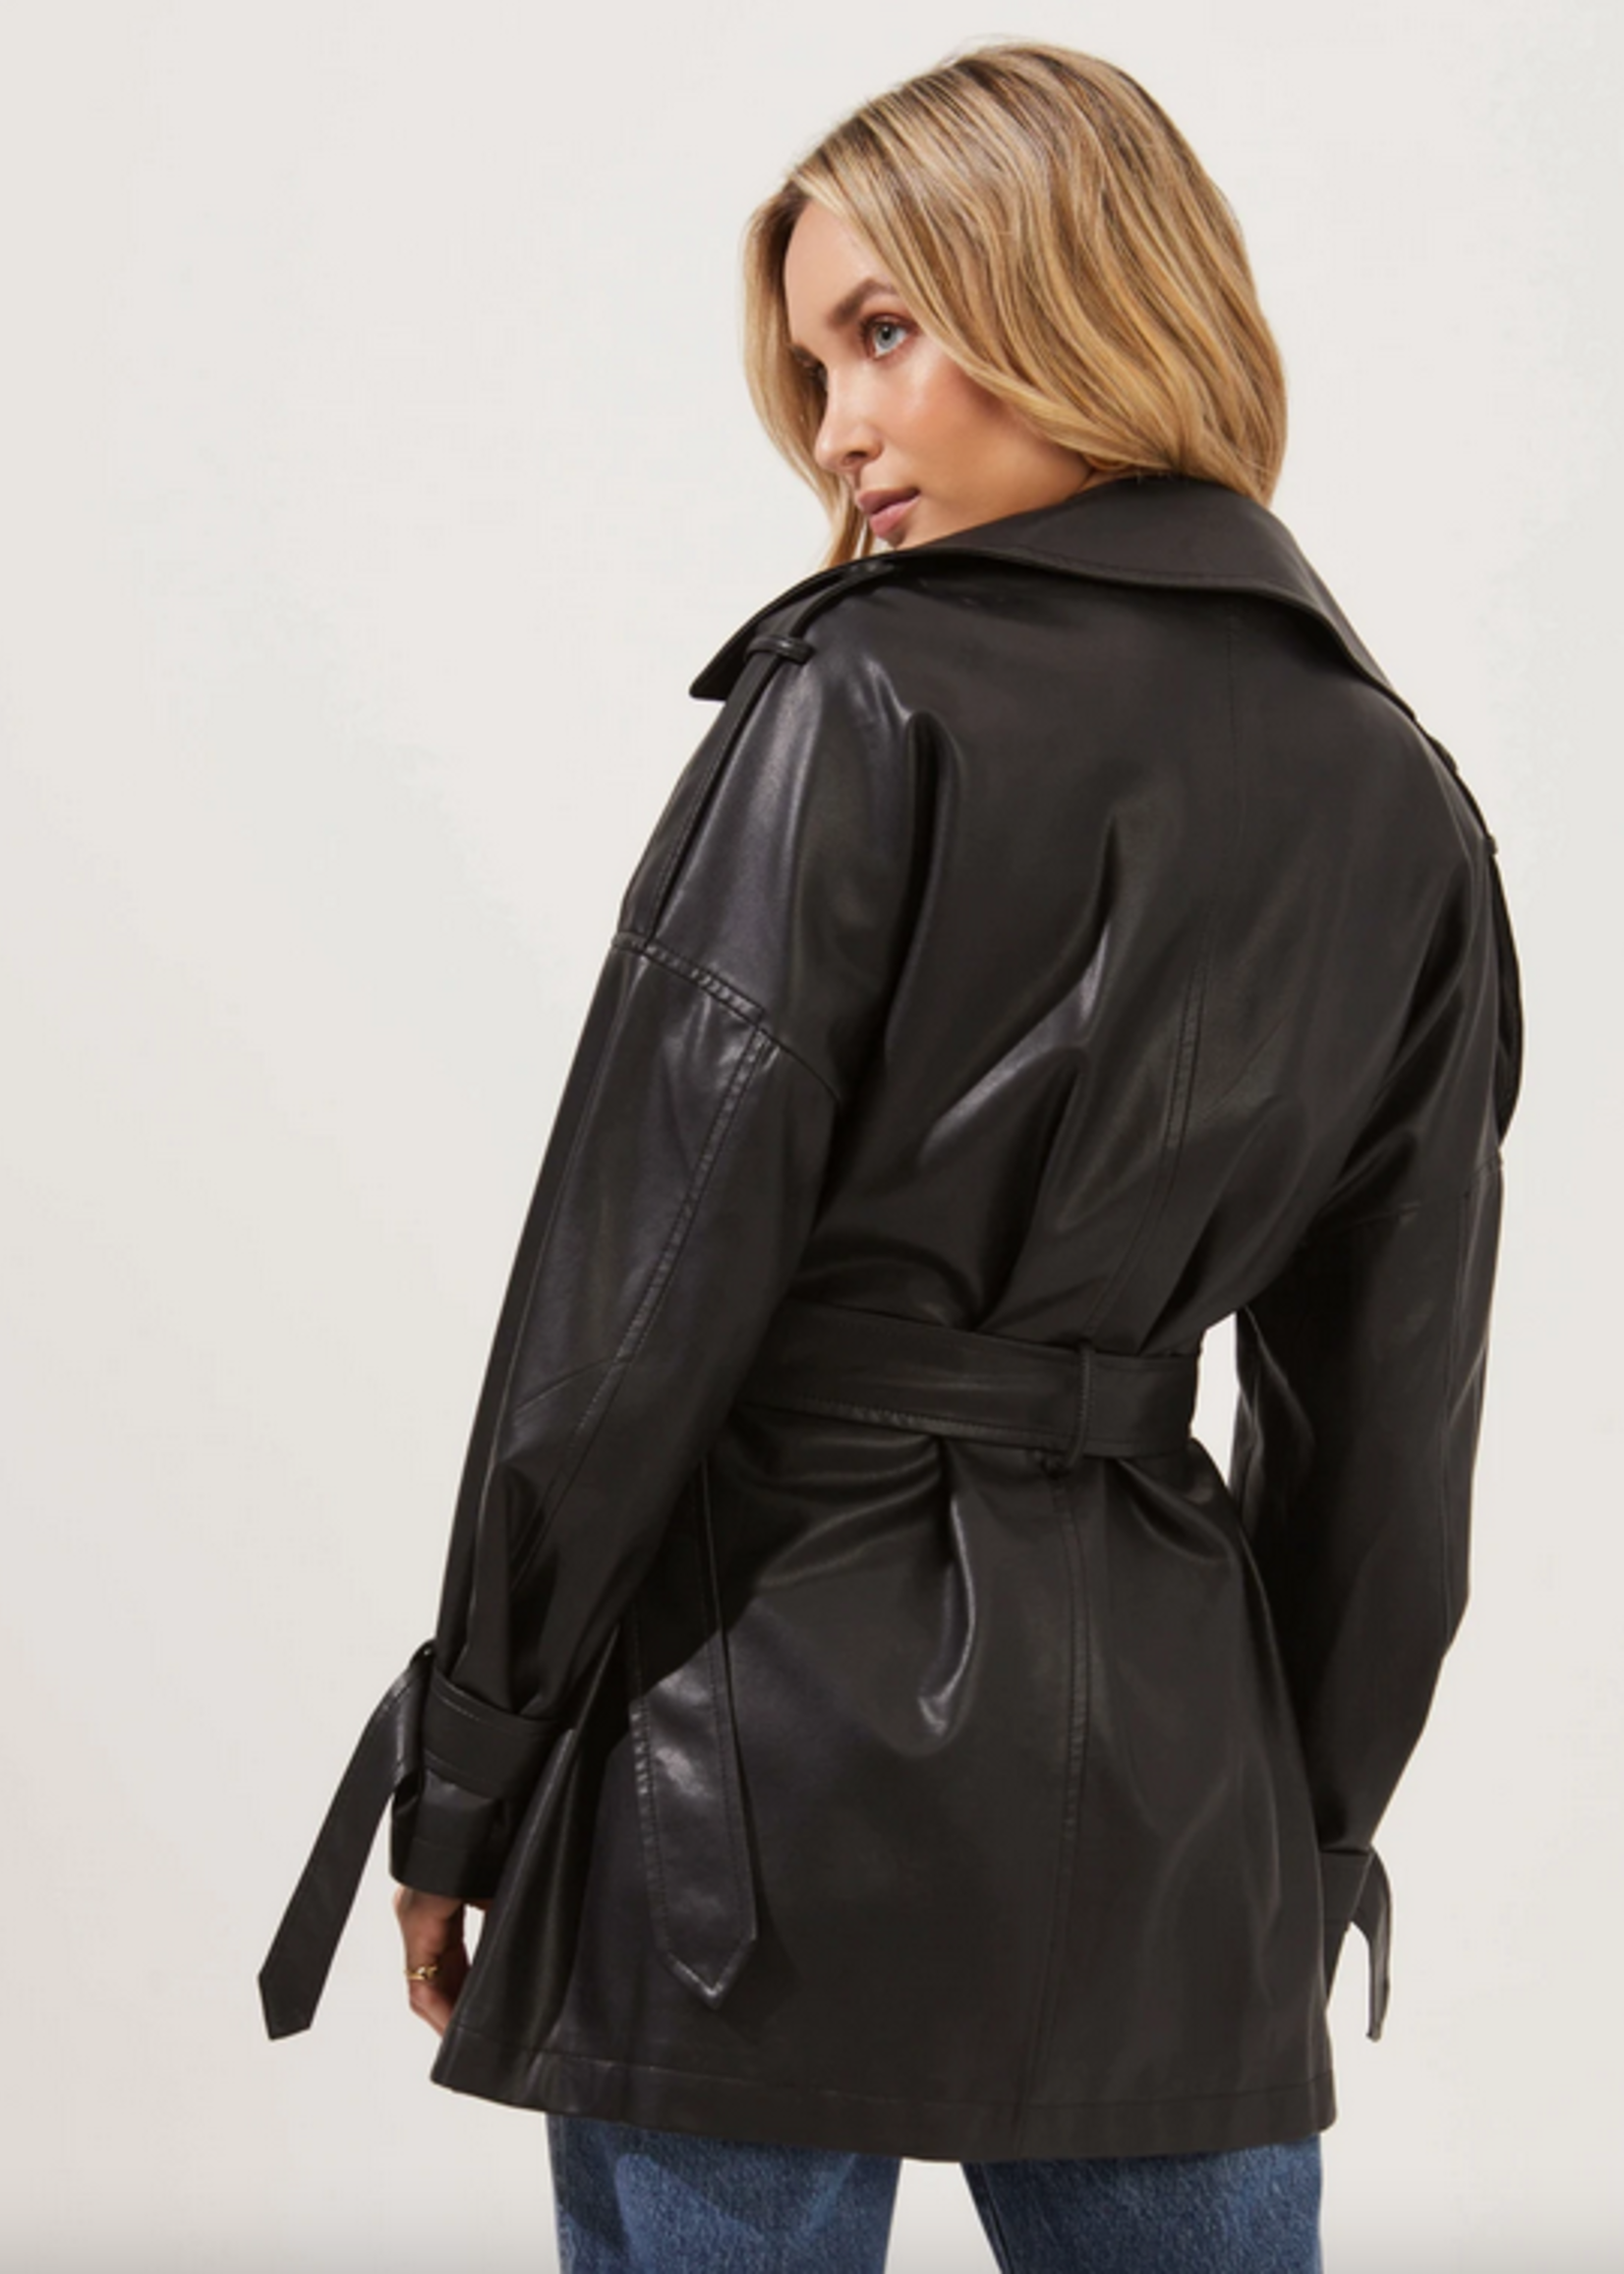 Elitaire Boutique Peoria Jacket in Black